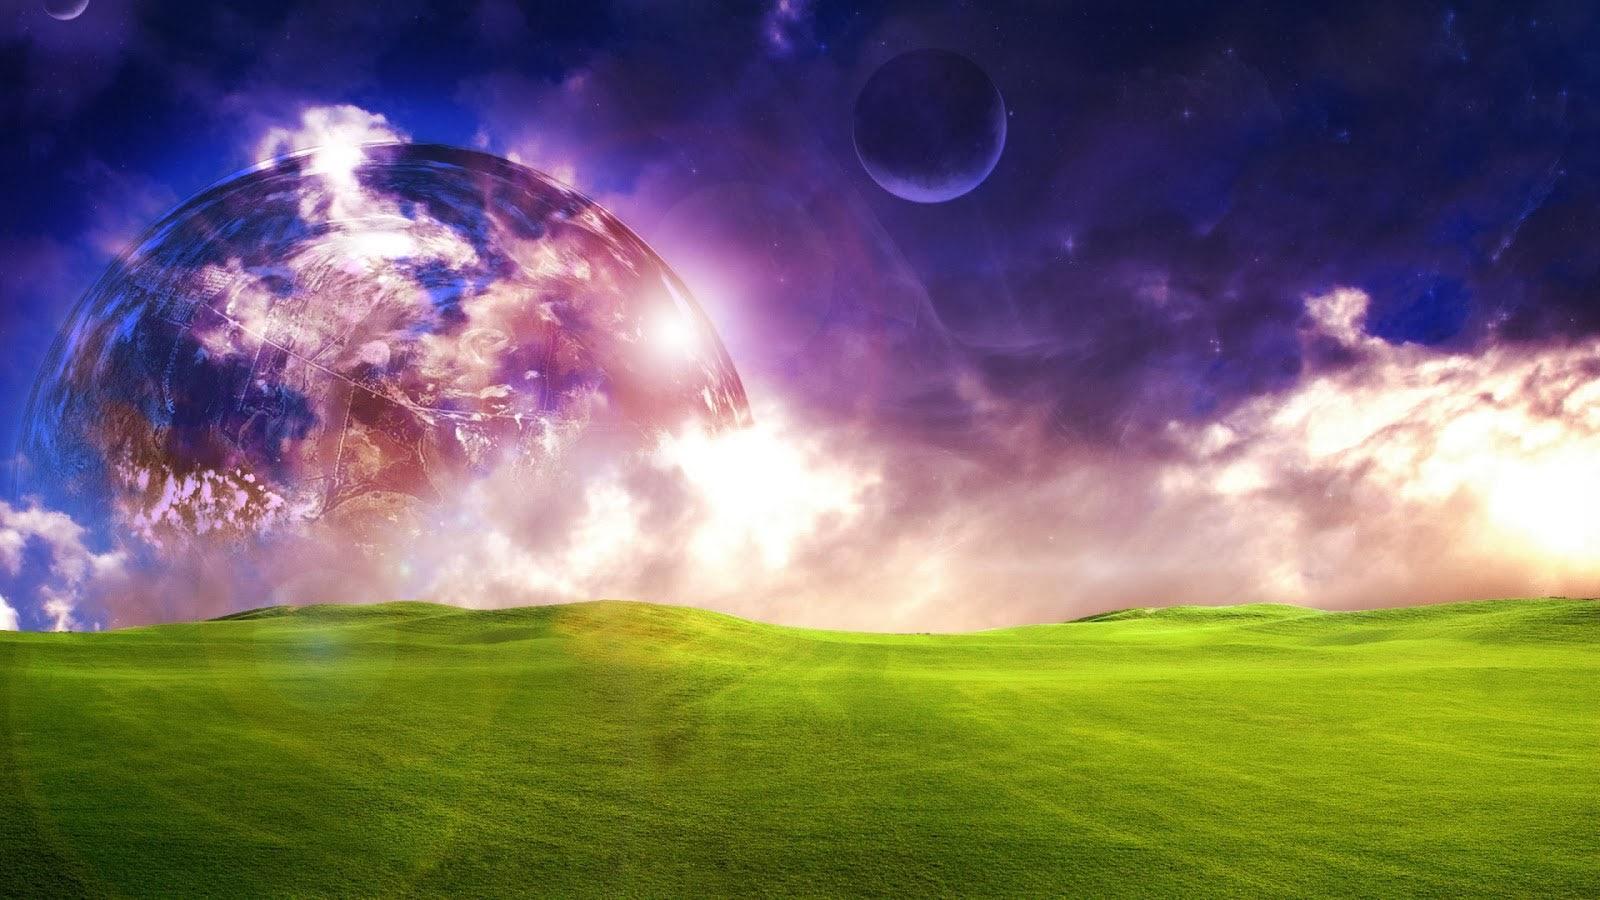 anstract earth wallpaper - photo #6